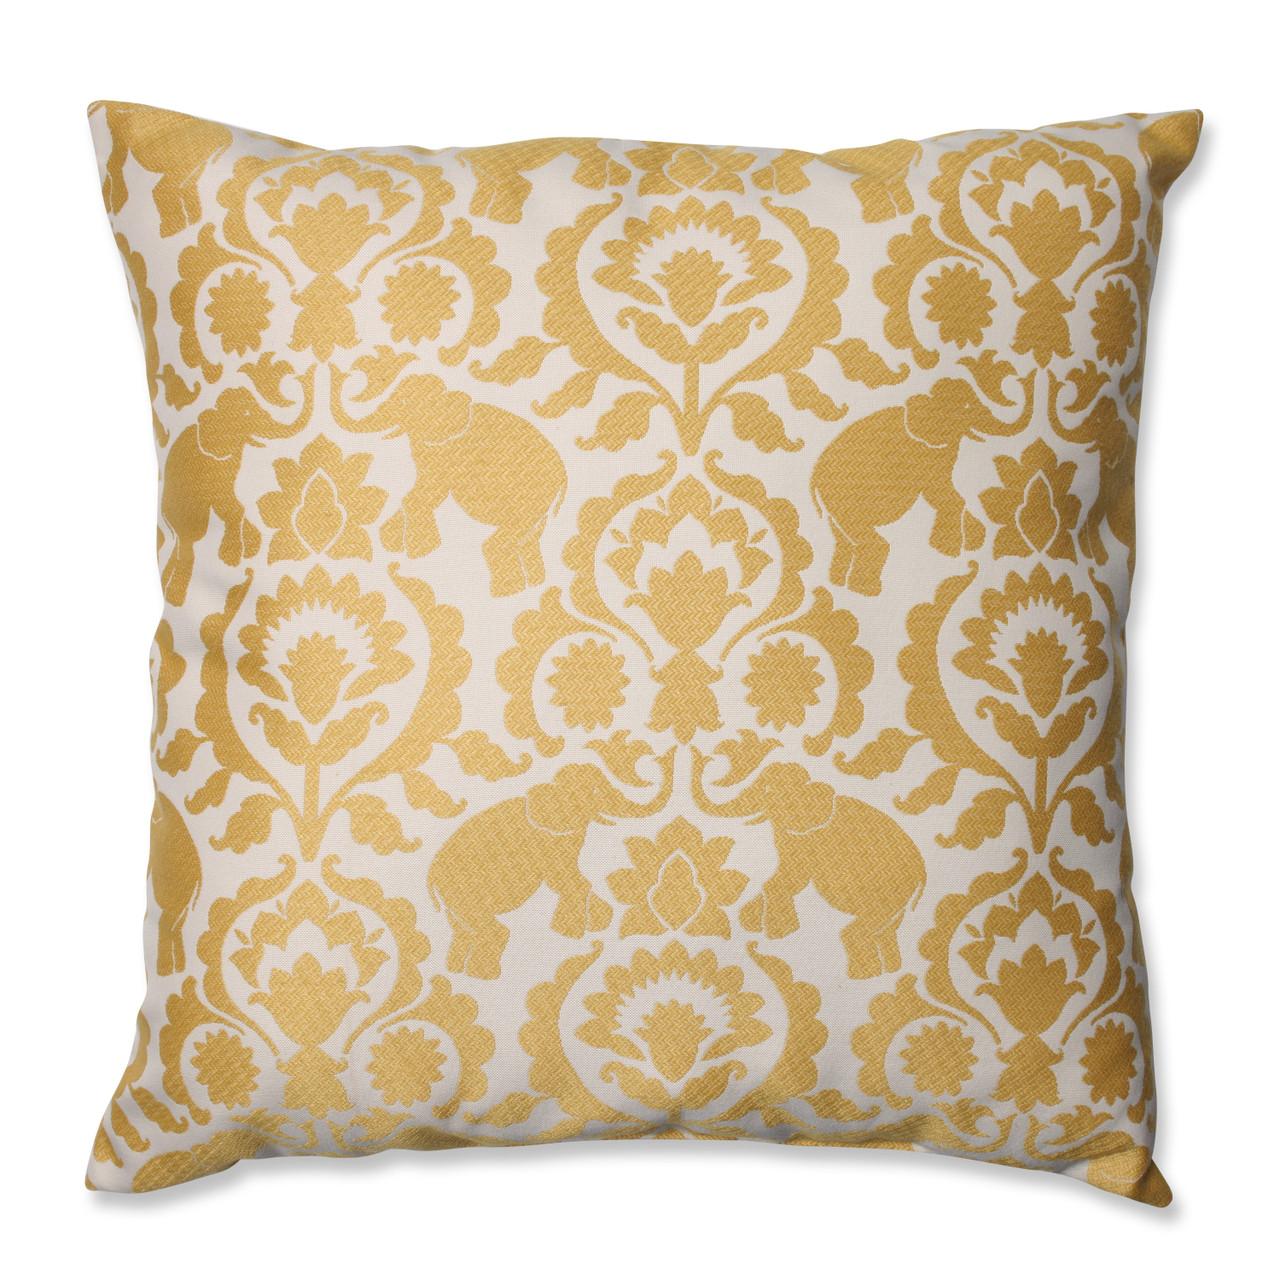 Pillow Perfect Madrid Persian Floor Pillow 24.5